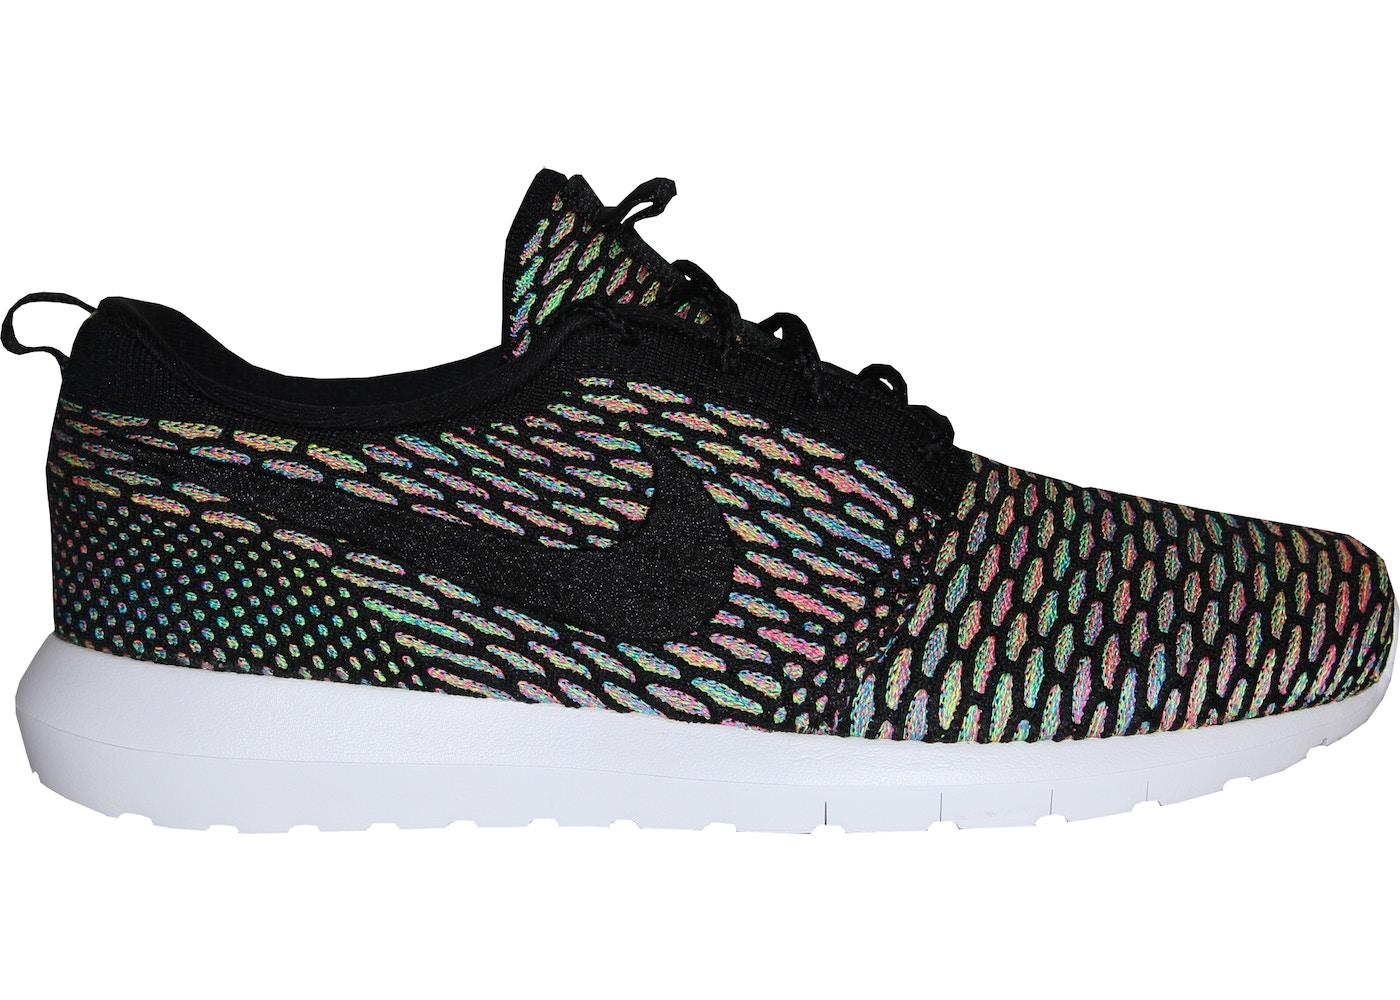 Buty Nike Roshe Run Bordowe Damskie R 36 40 6133908261 Oficjalne Archiwum Allegro